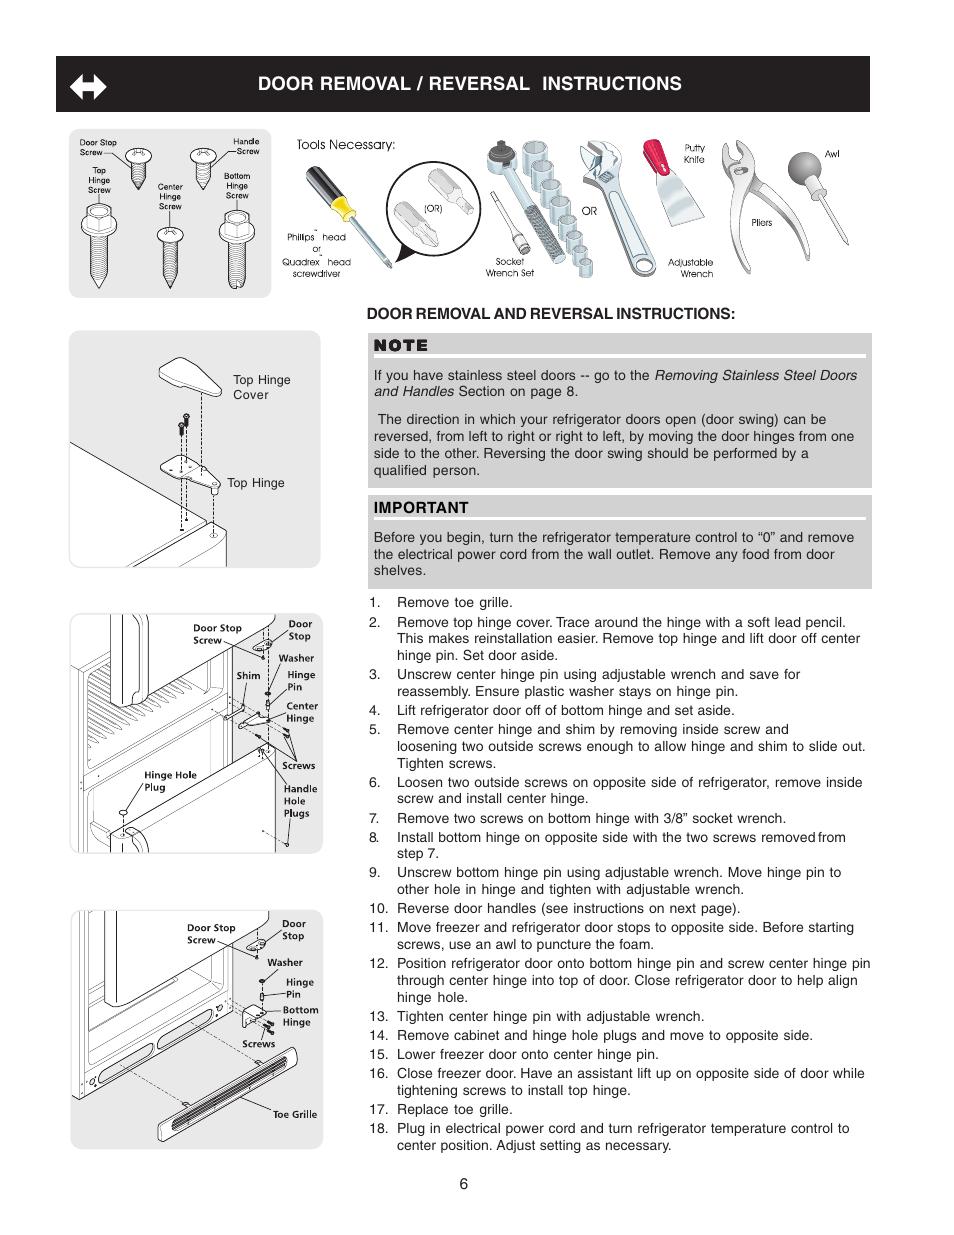 Crosley Refrigerator Diagram Car Fuse Box Wiring Door Removal Reversal Instructions Top Rh Manualsdir Com Shelvador 1948